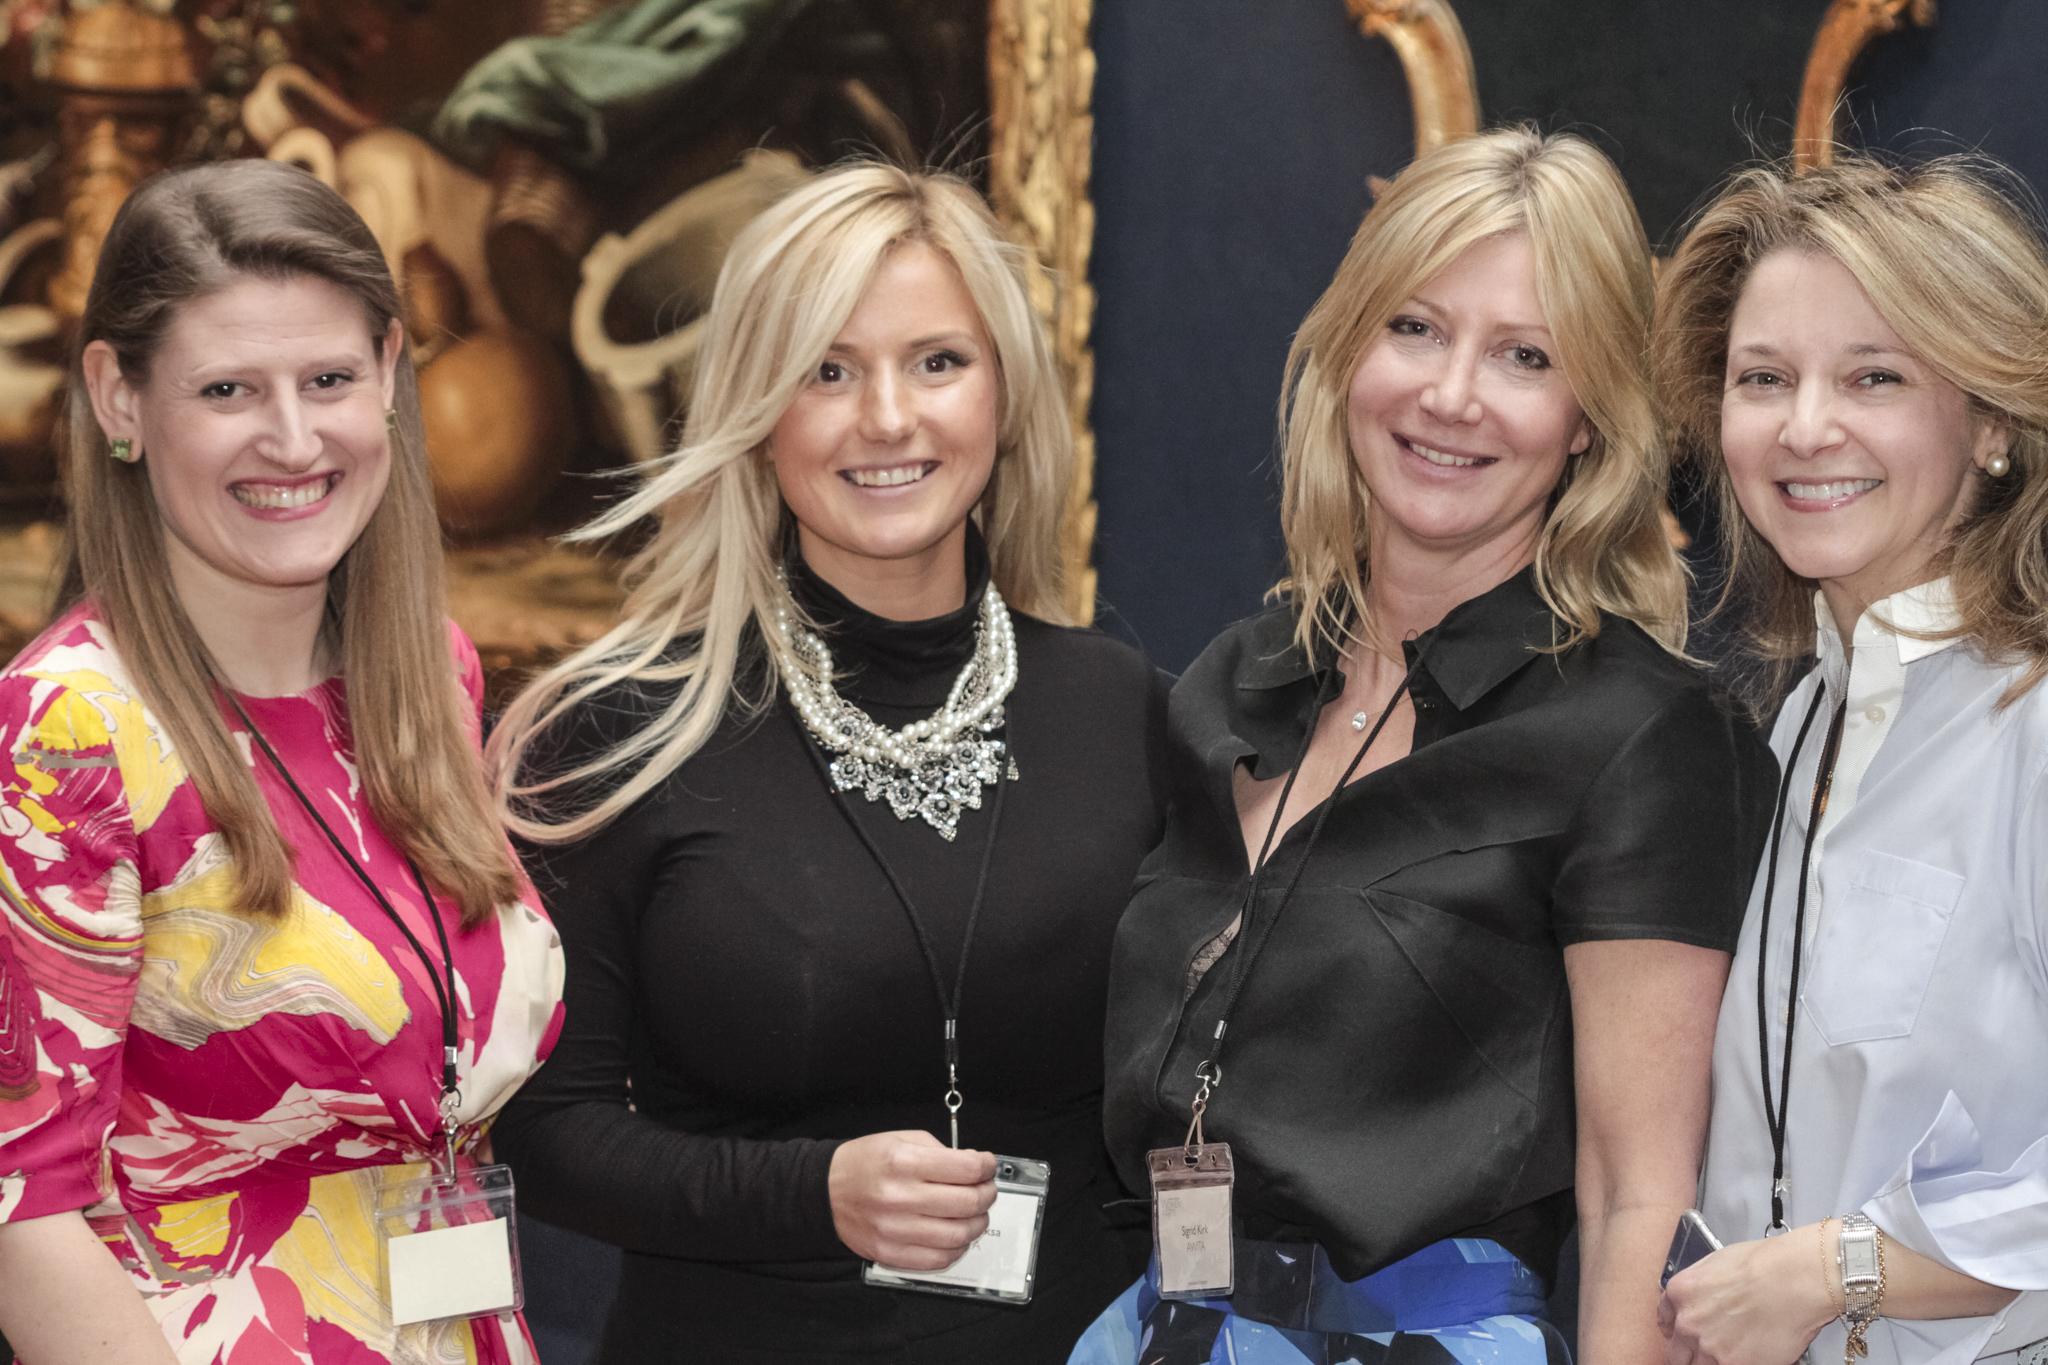 The co-founders of AWITA, Theodora Clarke, Katrina Aleksa, Sigrid Kirk and Kate Gordon